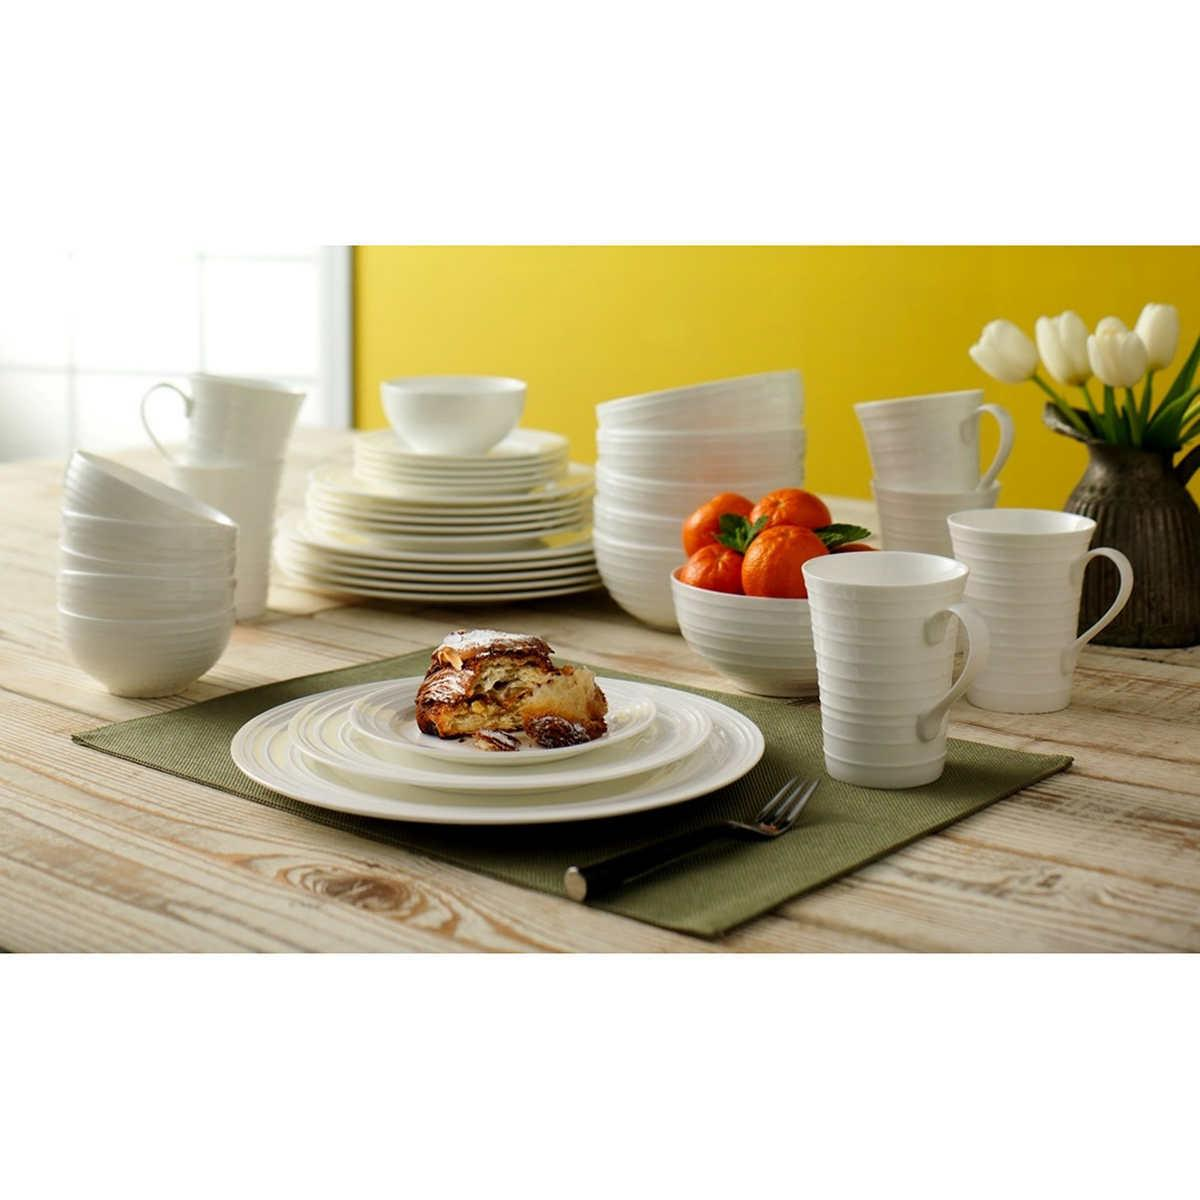 Mikasa Dinnerware Set Bone China Services for Plates Bowls